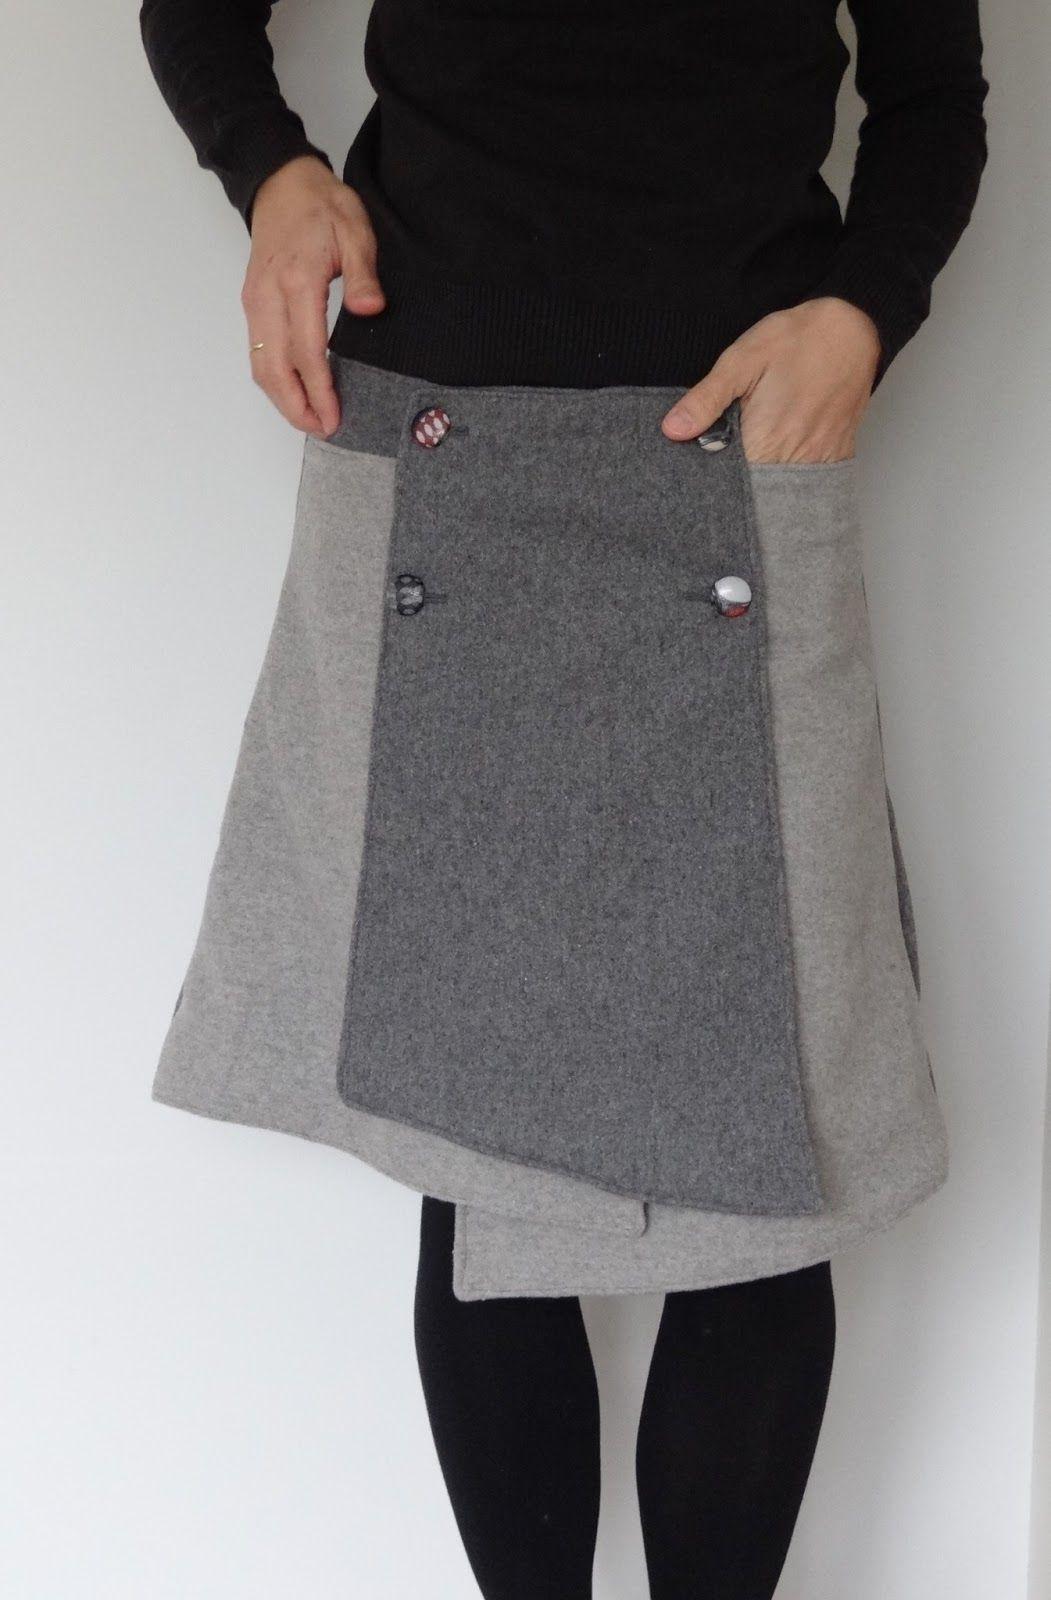 skirt | My Style | Pinterest | Kleidung